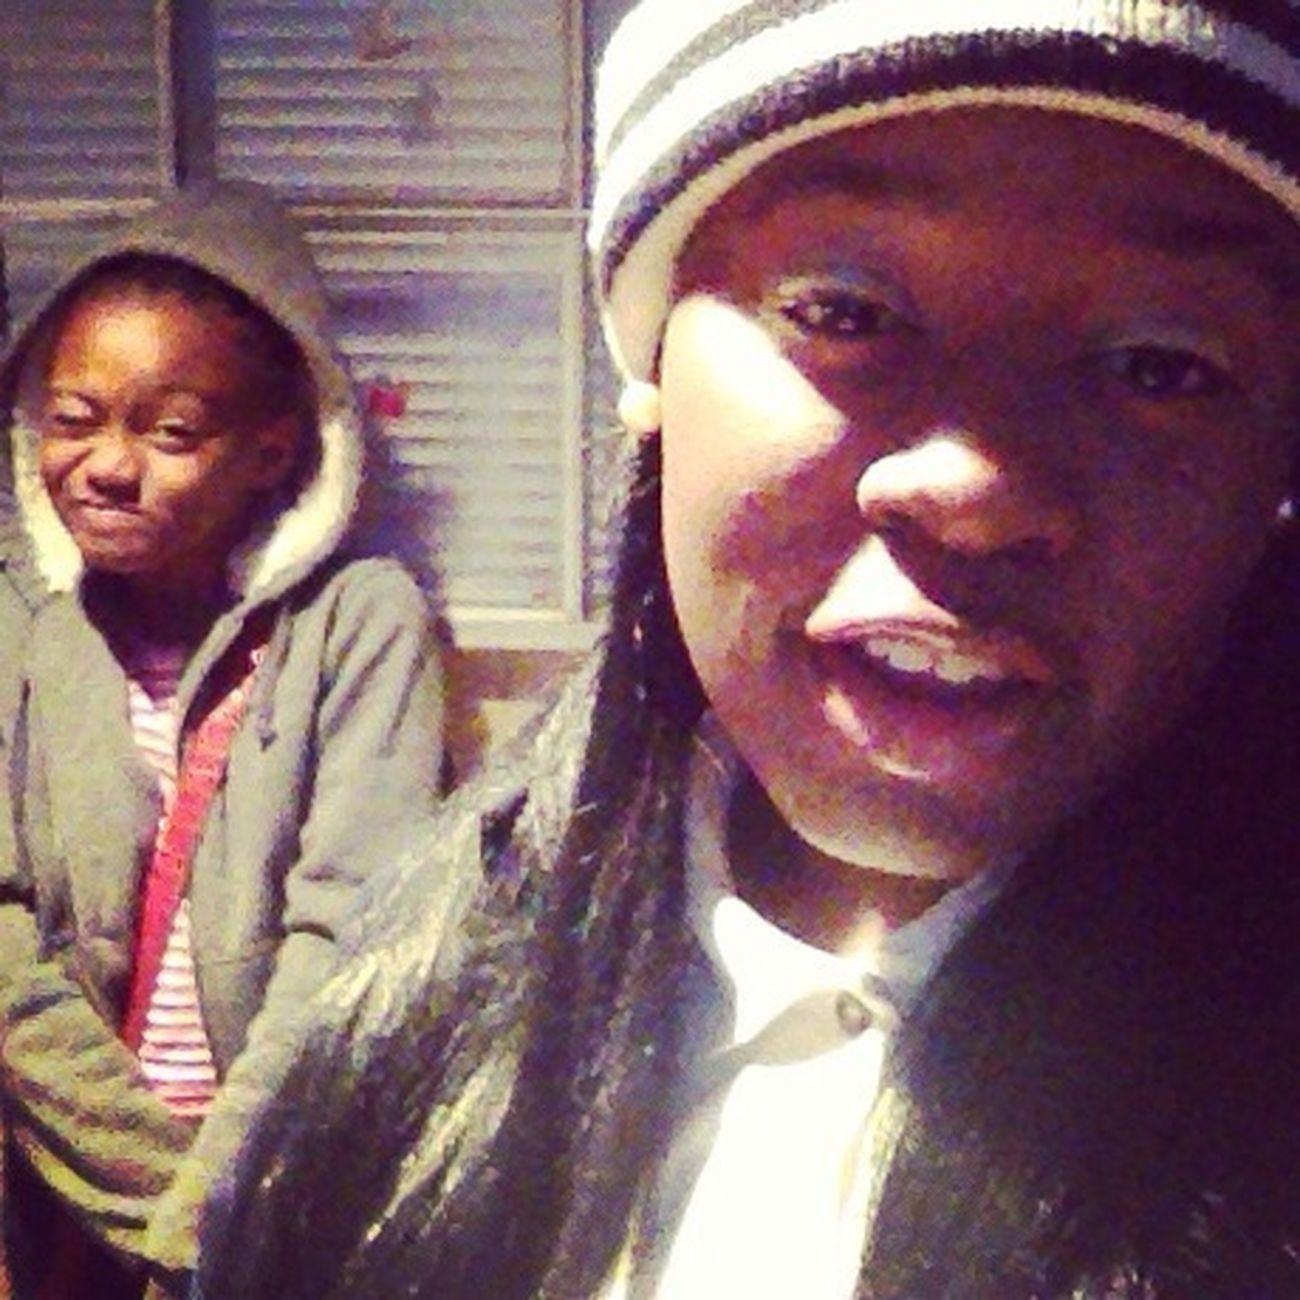 Yesterday Thoo ❤